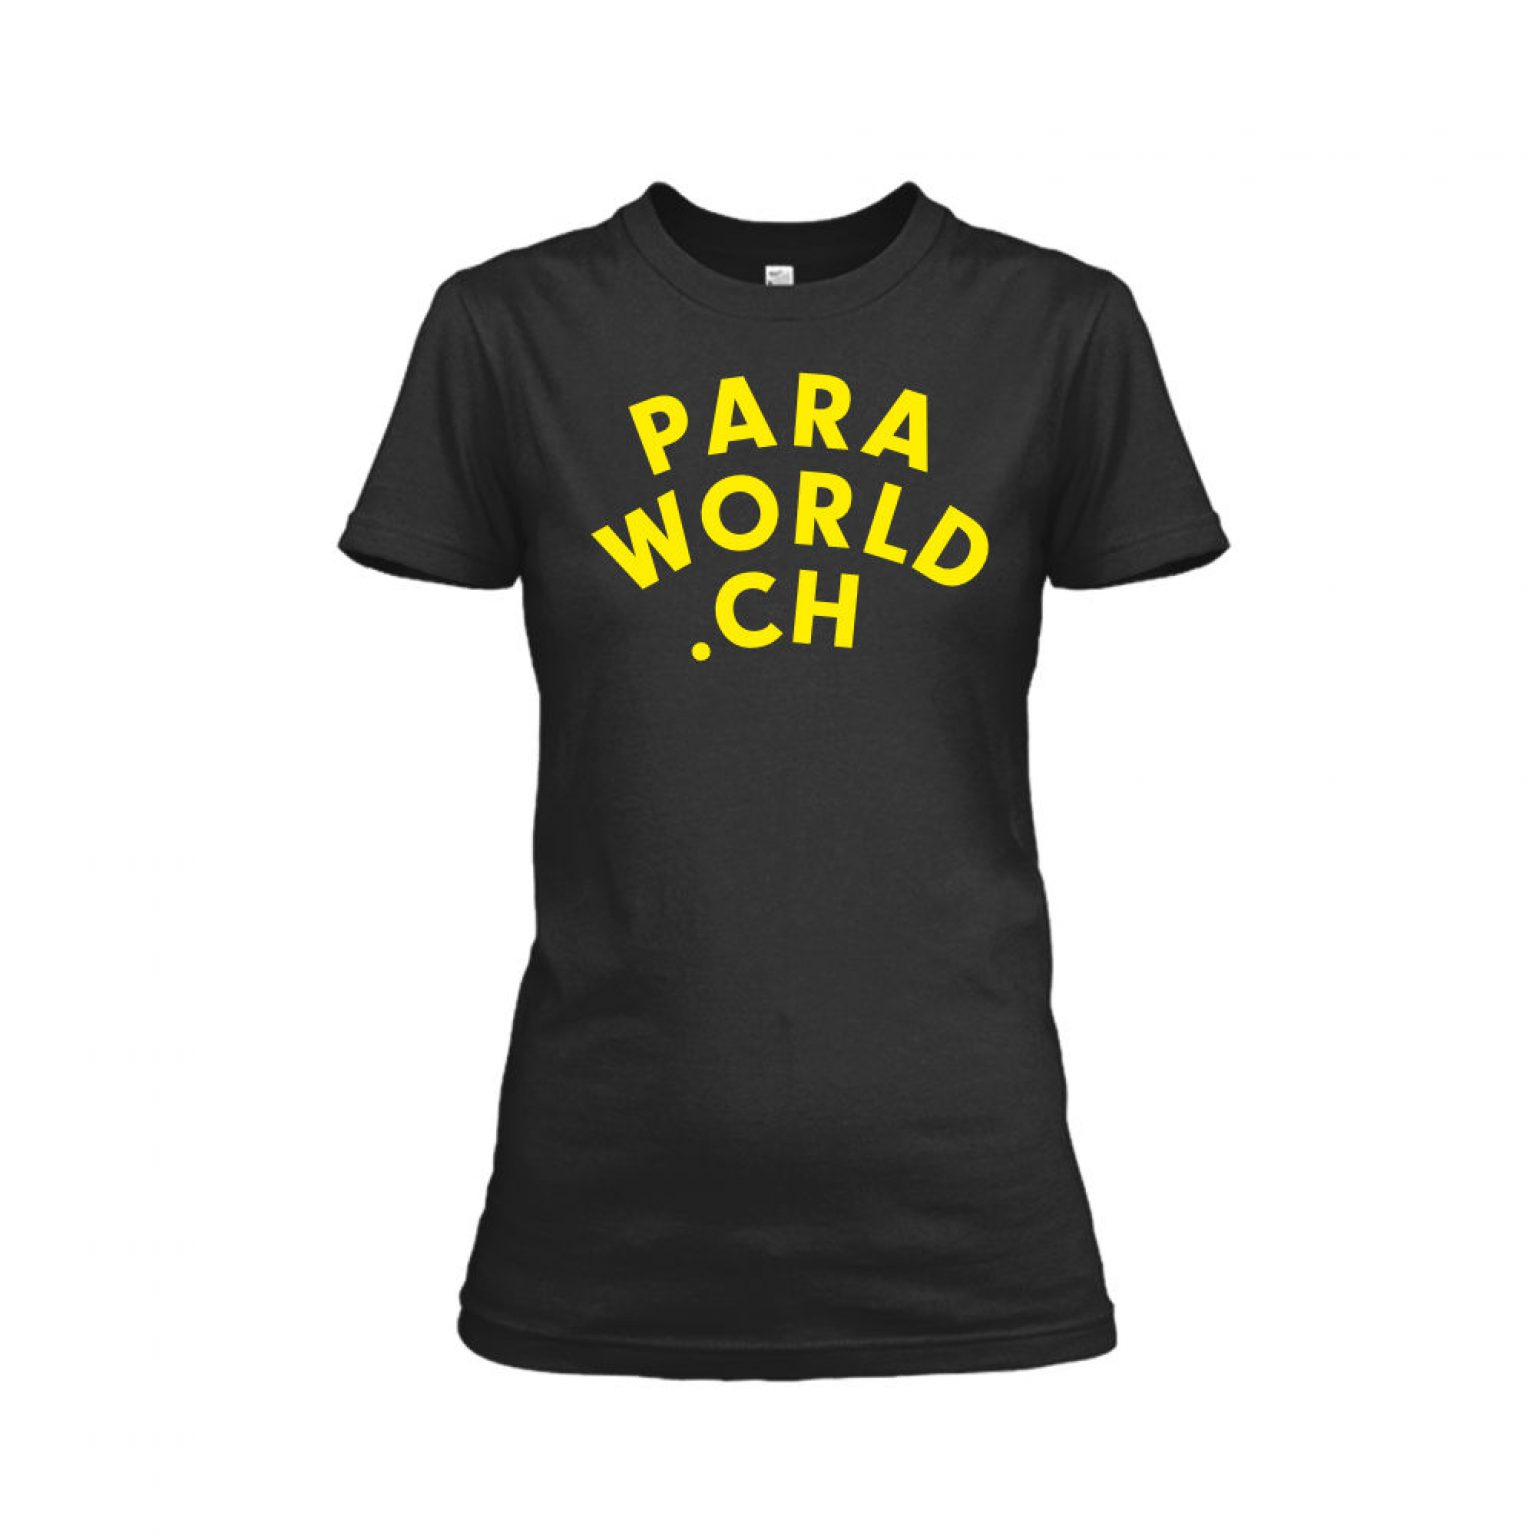 PW ClassicYellow shirt damen black